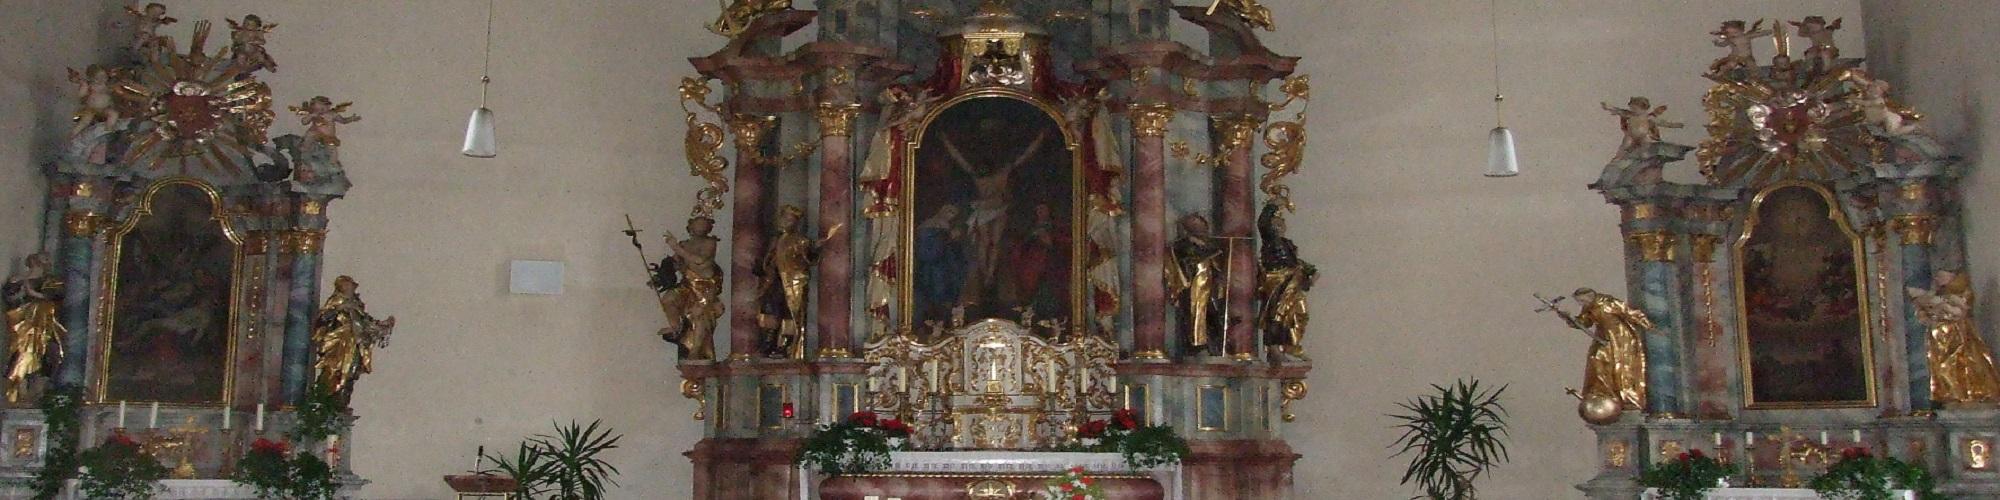 Oberweißenbrunn St. Antonius